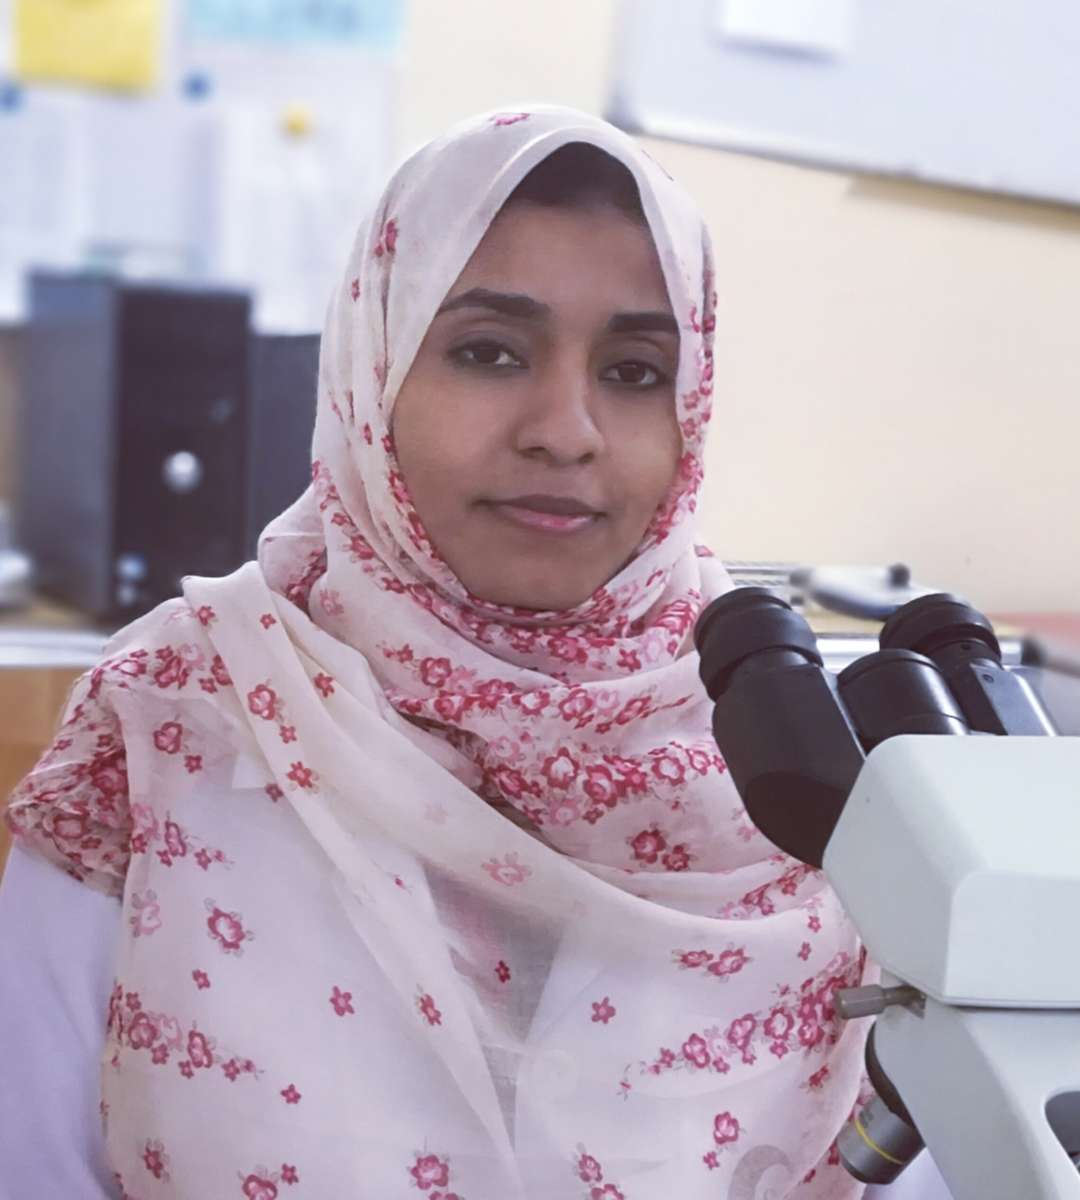 (3) Mona Ahmed Mohammed